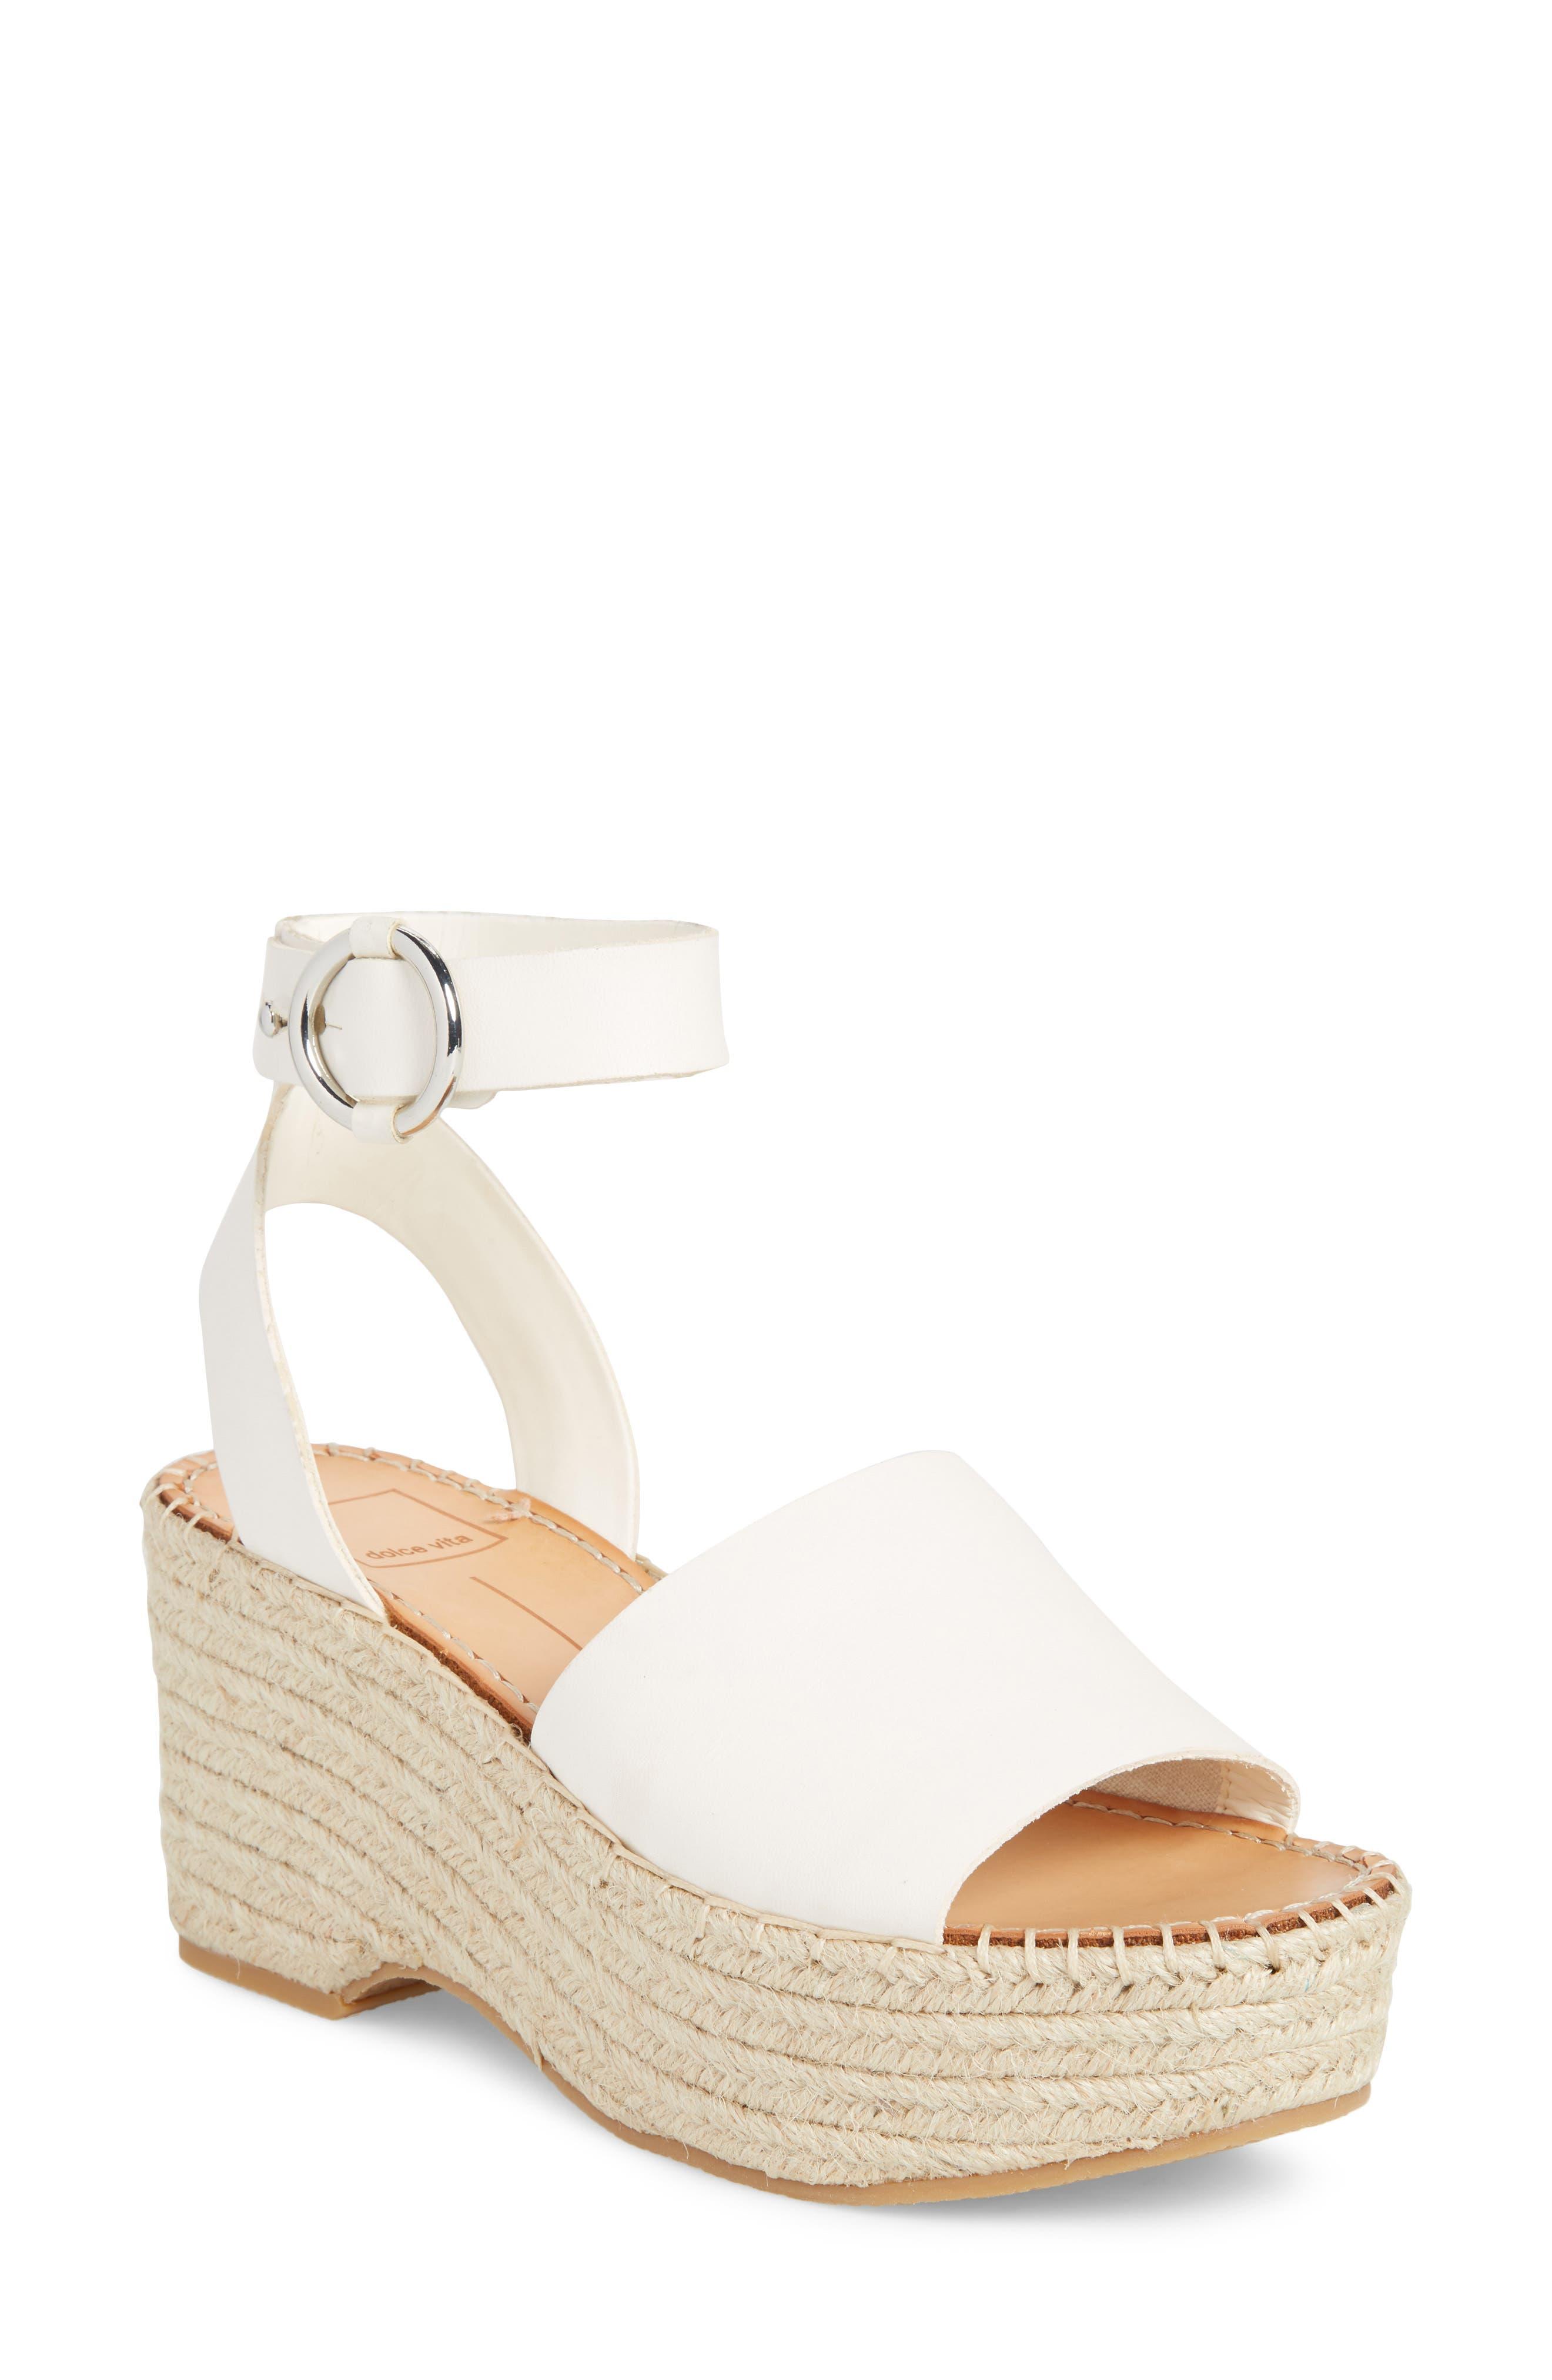 DOLCE VITA, Lesly Espadrille Platform Sandal, Main thumbnail 1, color, OFF WHITE